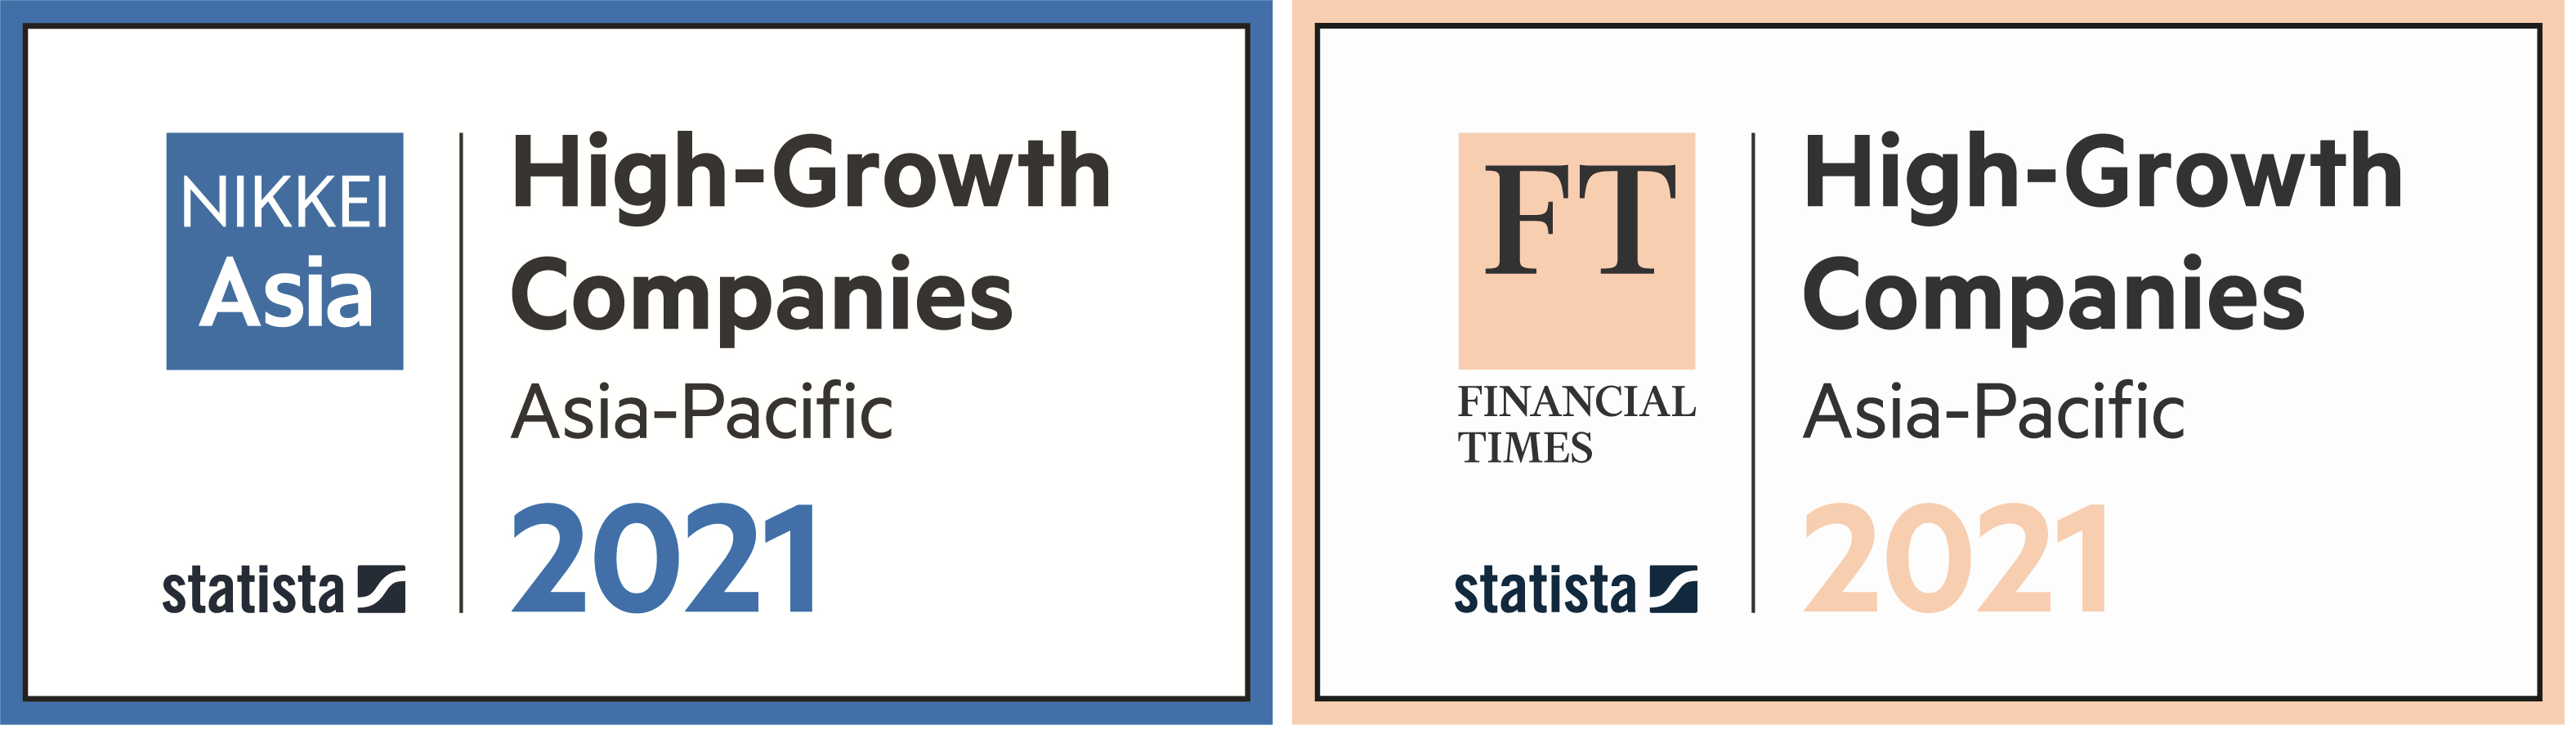 High-Growth Companies Asia-Pacific 2021ランクインのお知らせ